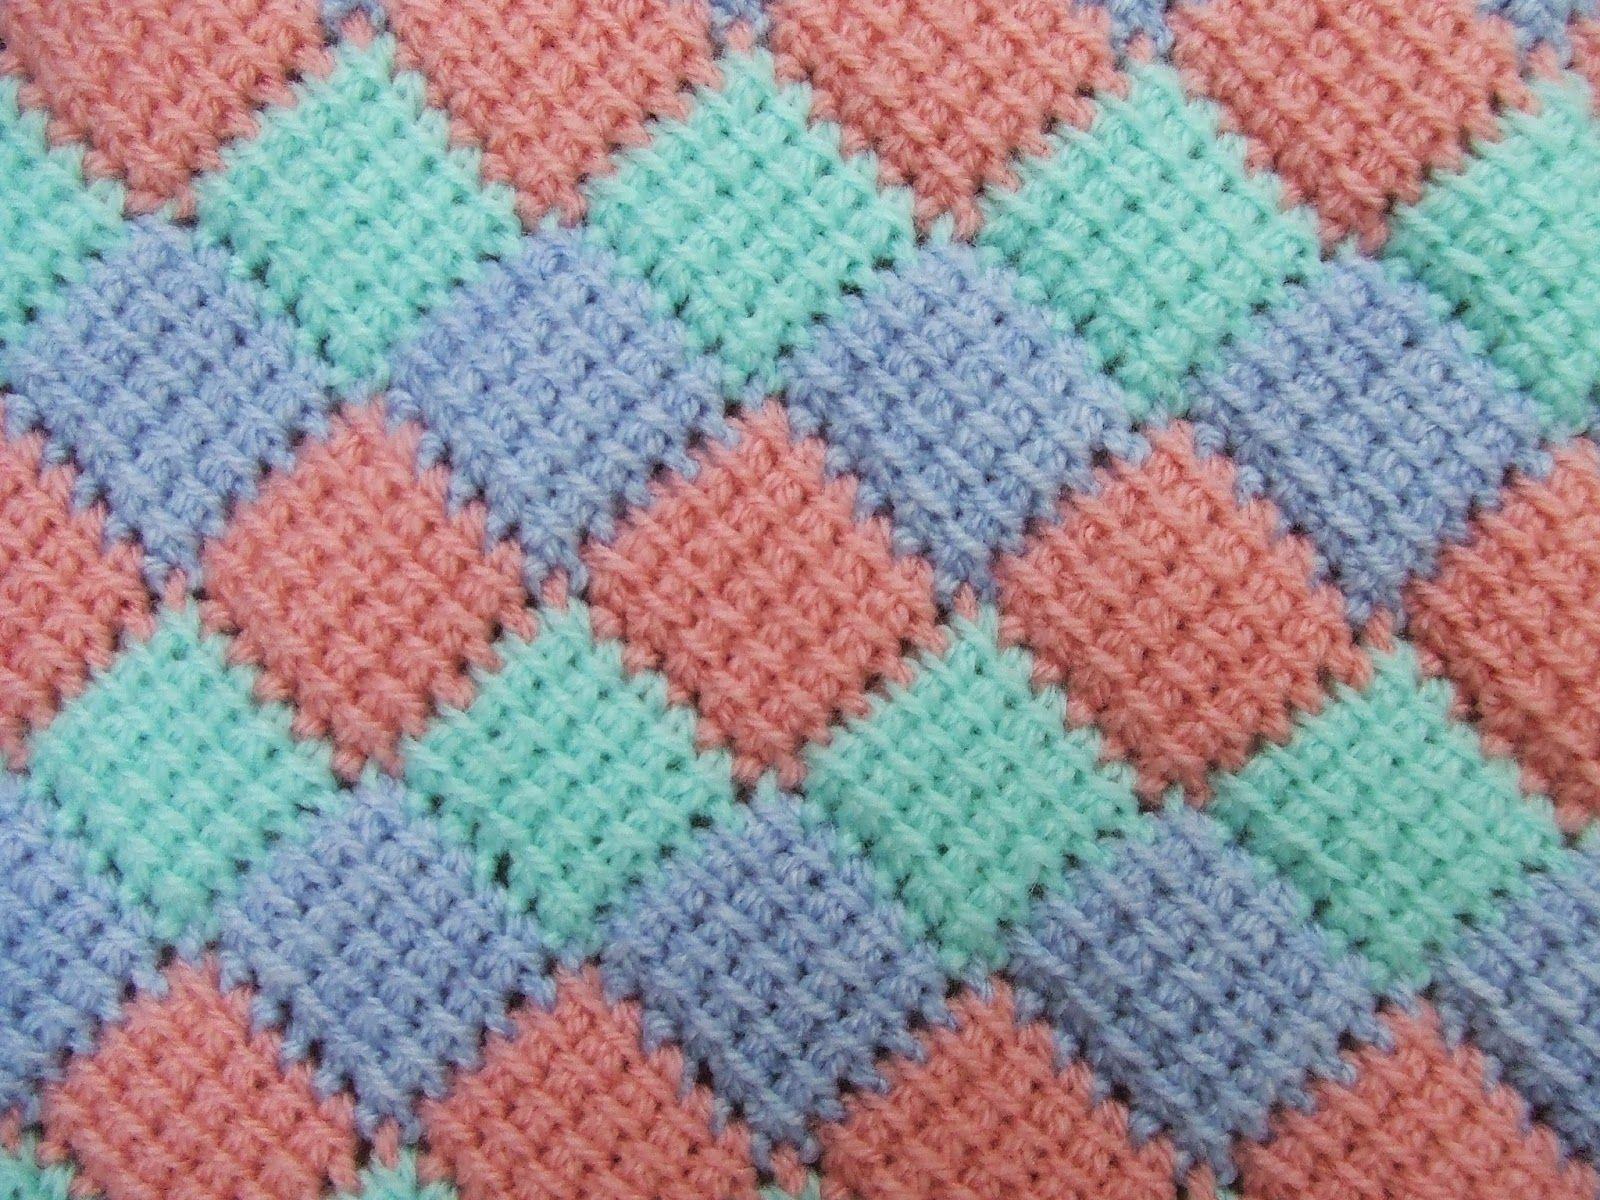 My world of crochet, entrelac, häkeln, crochet babyblanket ...